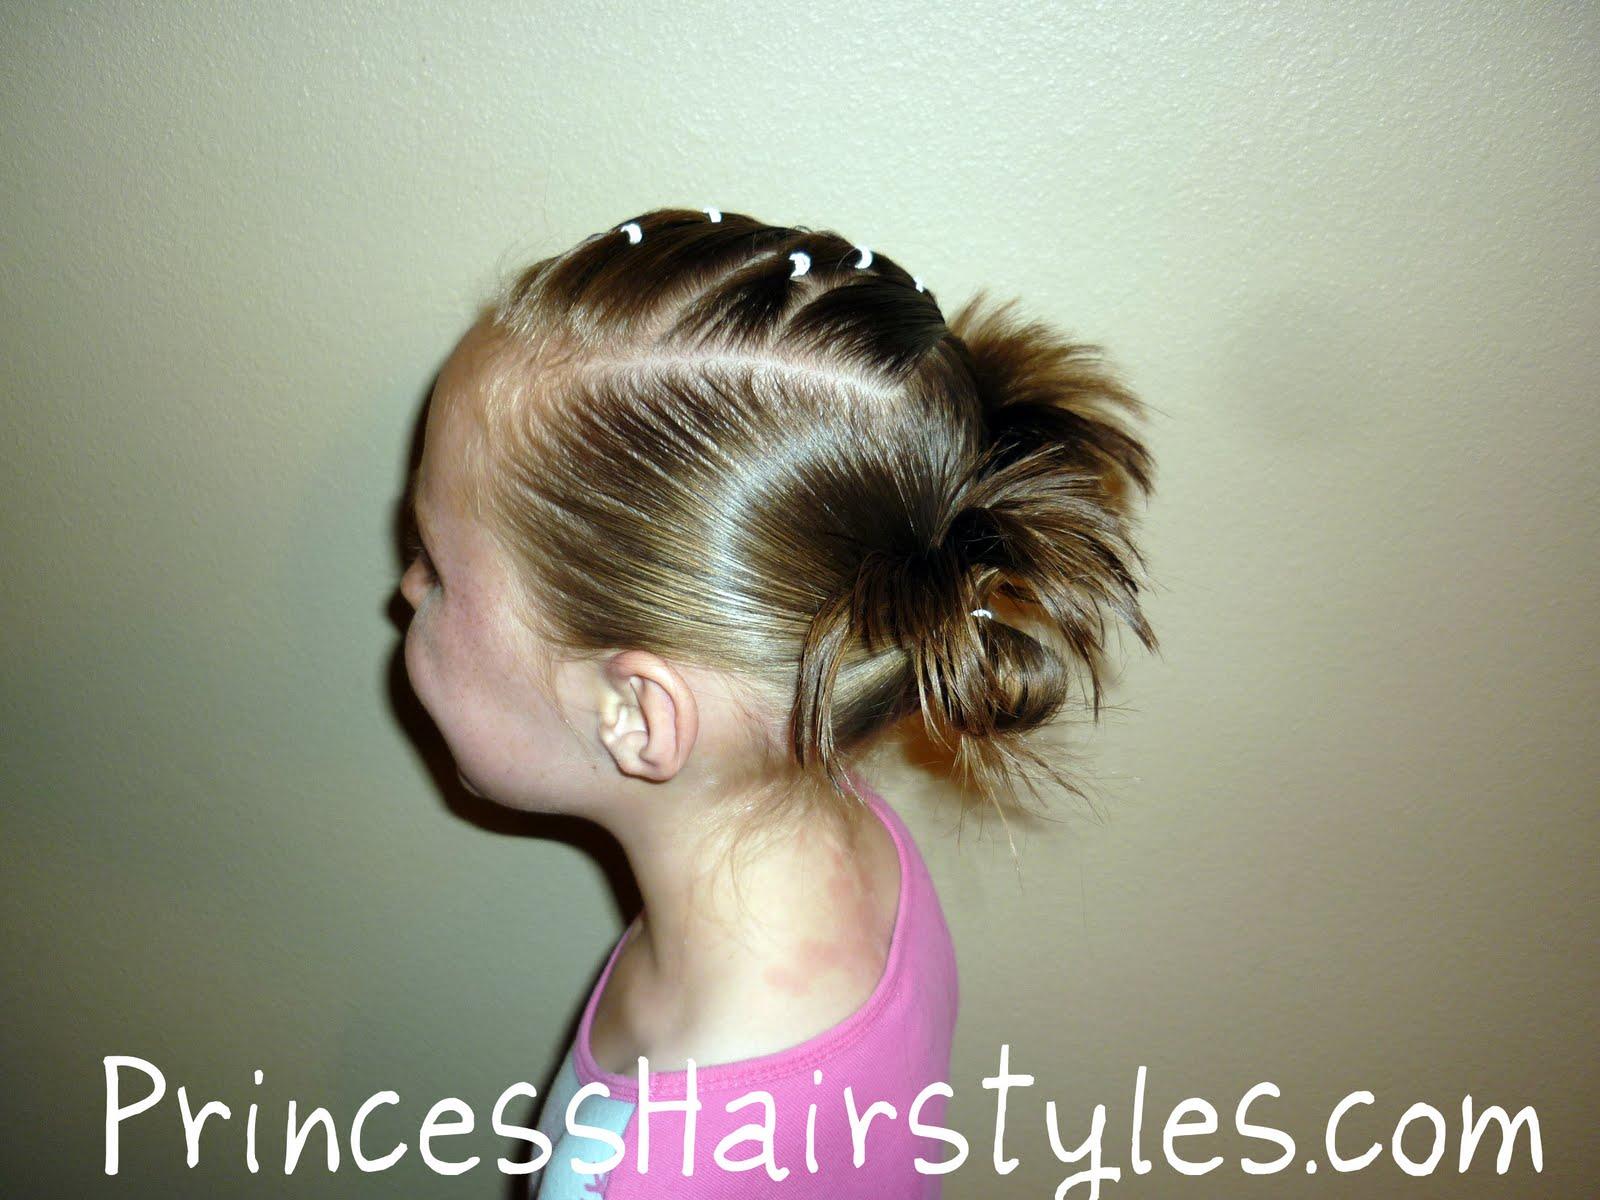 Astonishing Gymnastics Hair Styles Cute Hairstyles Short Hairstyles For Black Women Fulllsitofus